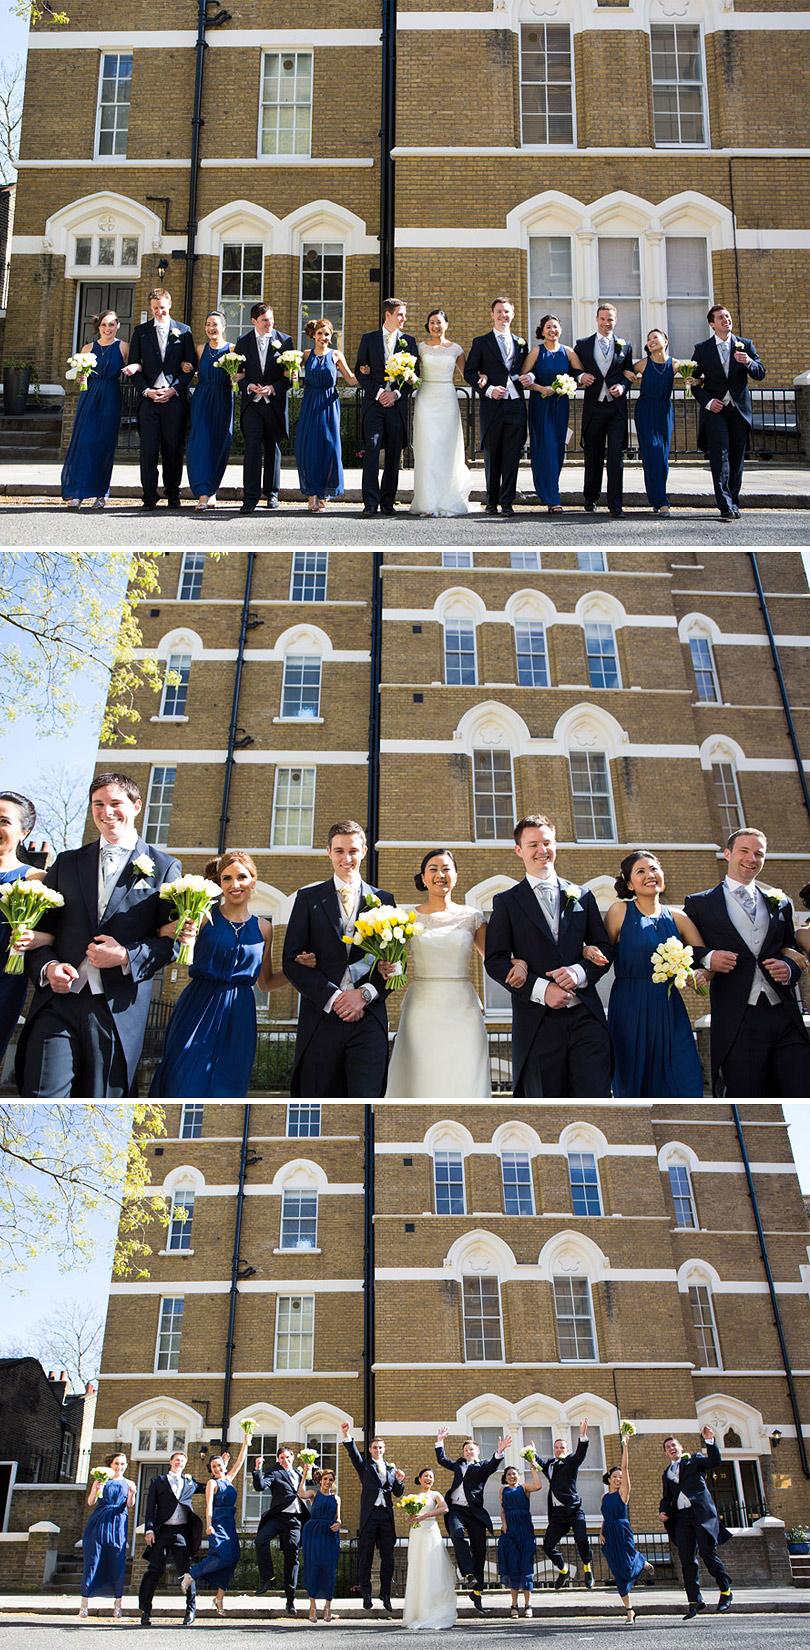 Daphne&Alex_The-Berkeley-Wedding-11.jpg